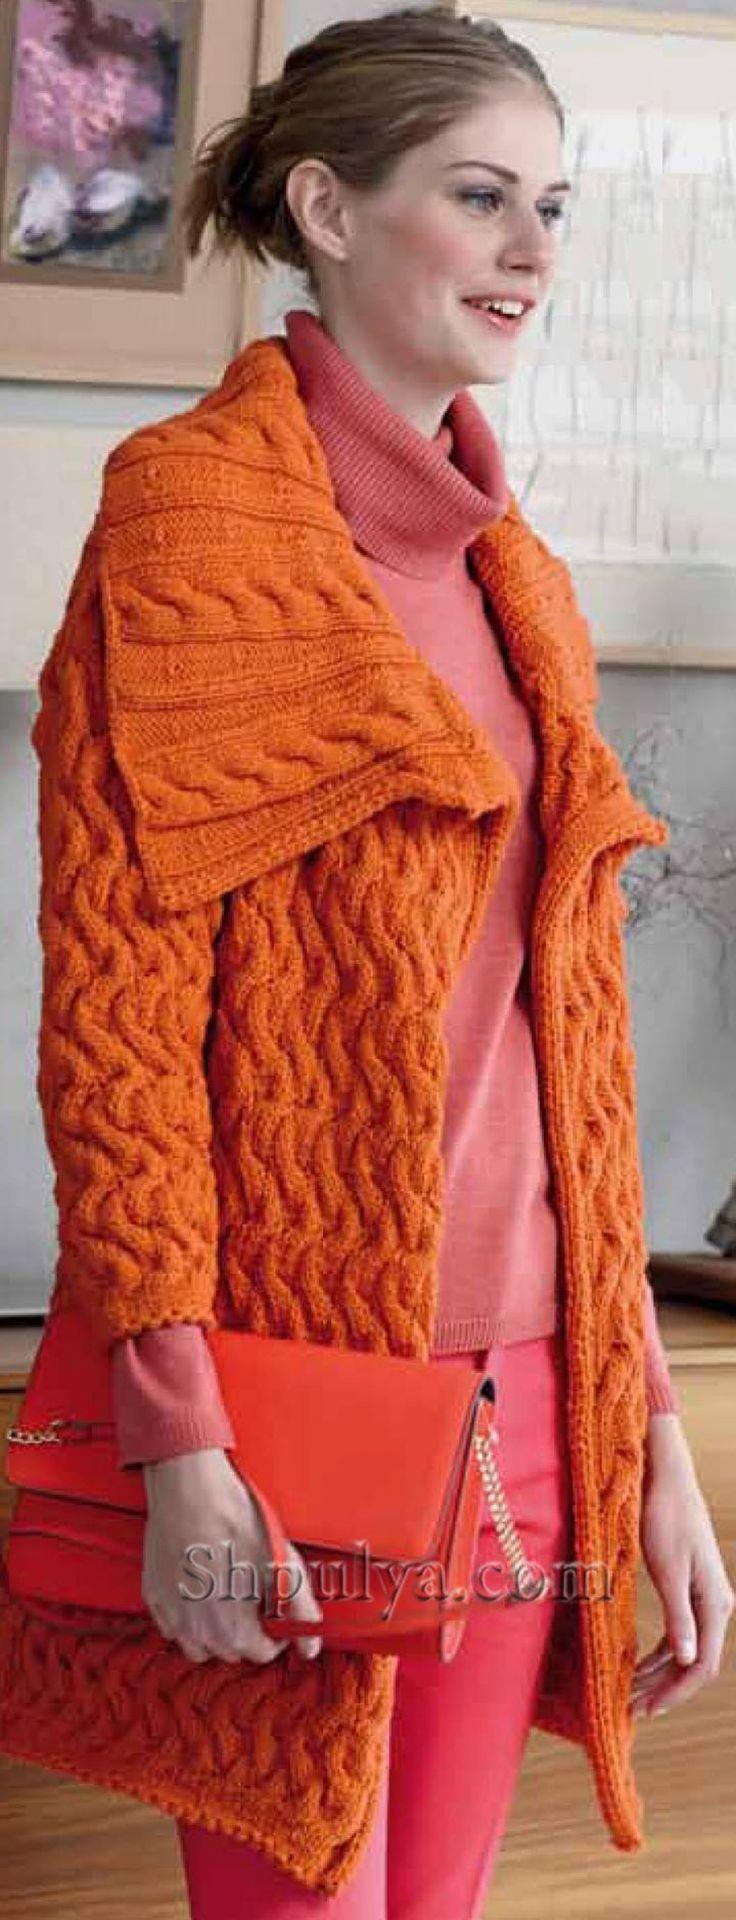 Оранжевый  кардиган с косами спицами